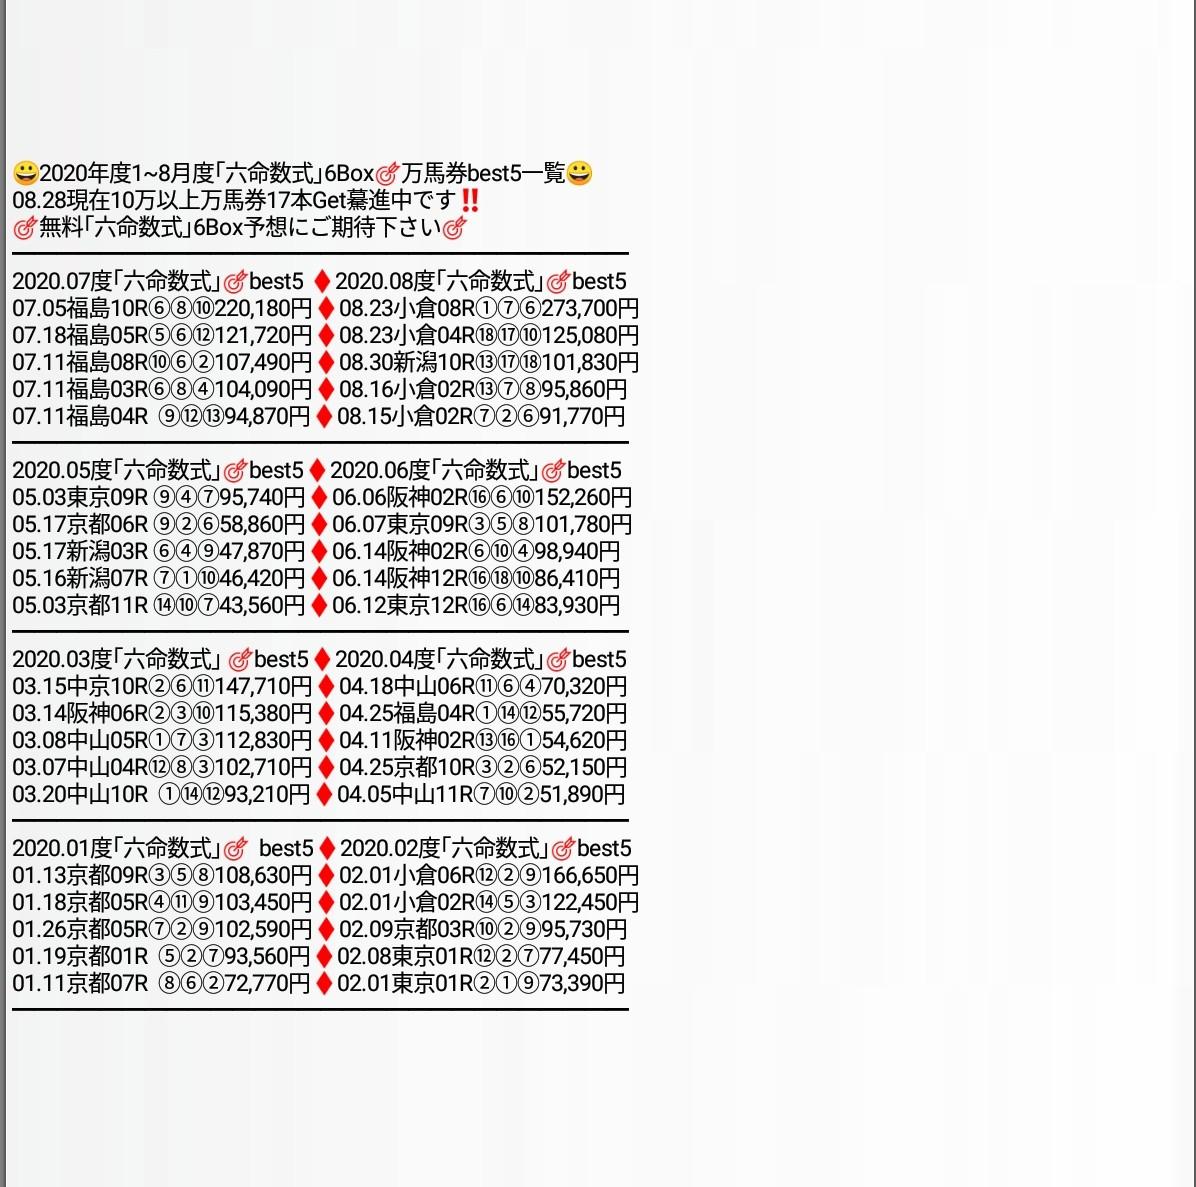 09.26中京08R馬単、三連単6頭Box .F予想公開09.26中京08R❶❷❸❹❺❻六命数.6馬番  ⑧⑨⑩⑪⑰⑱各軸馬単3点、三連単F12点⑰⇒⑩⑪⑱⇒⑧⑨⑩⑪⑰⑱⑪⇒⑨⑩⑰⇒⑧⑨⑩⑪⑰⑱⑱⇒⑩⑪⑰⇒⑧⑨⑩⑪⑰⑱⑨⇒⑧⑩⑪⇒⑧⑨⑩⑪⑰⑱他のレースはで販売中‼️